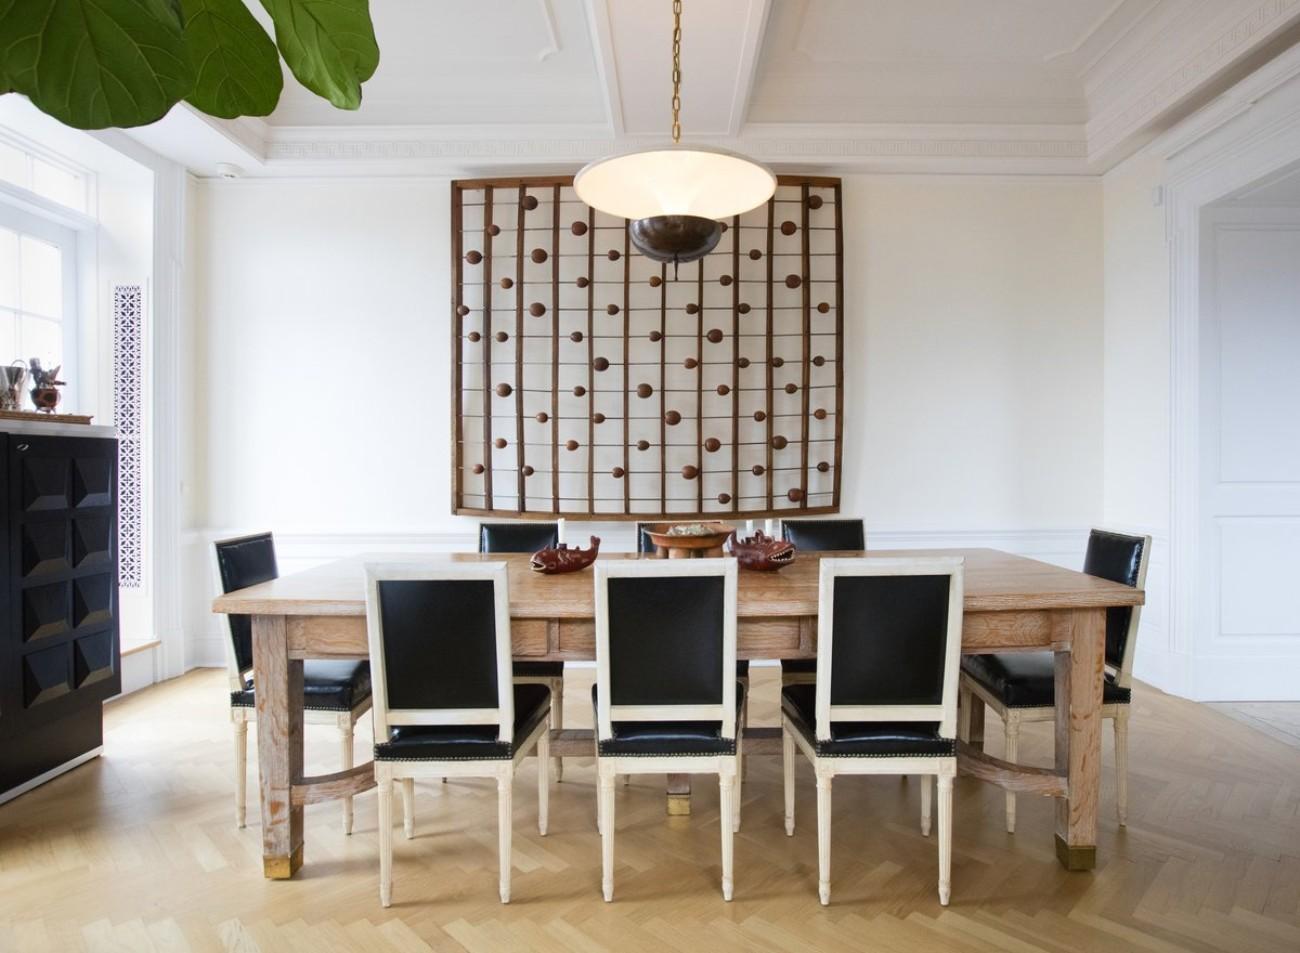 nate berkus dining room | Nate Berkus's Beautiful Dining Room Ideas